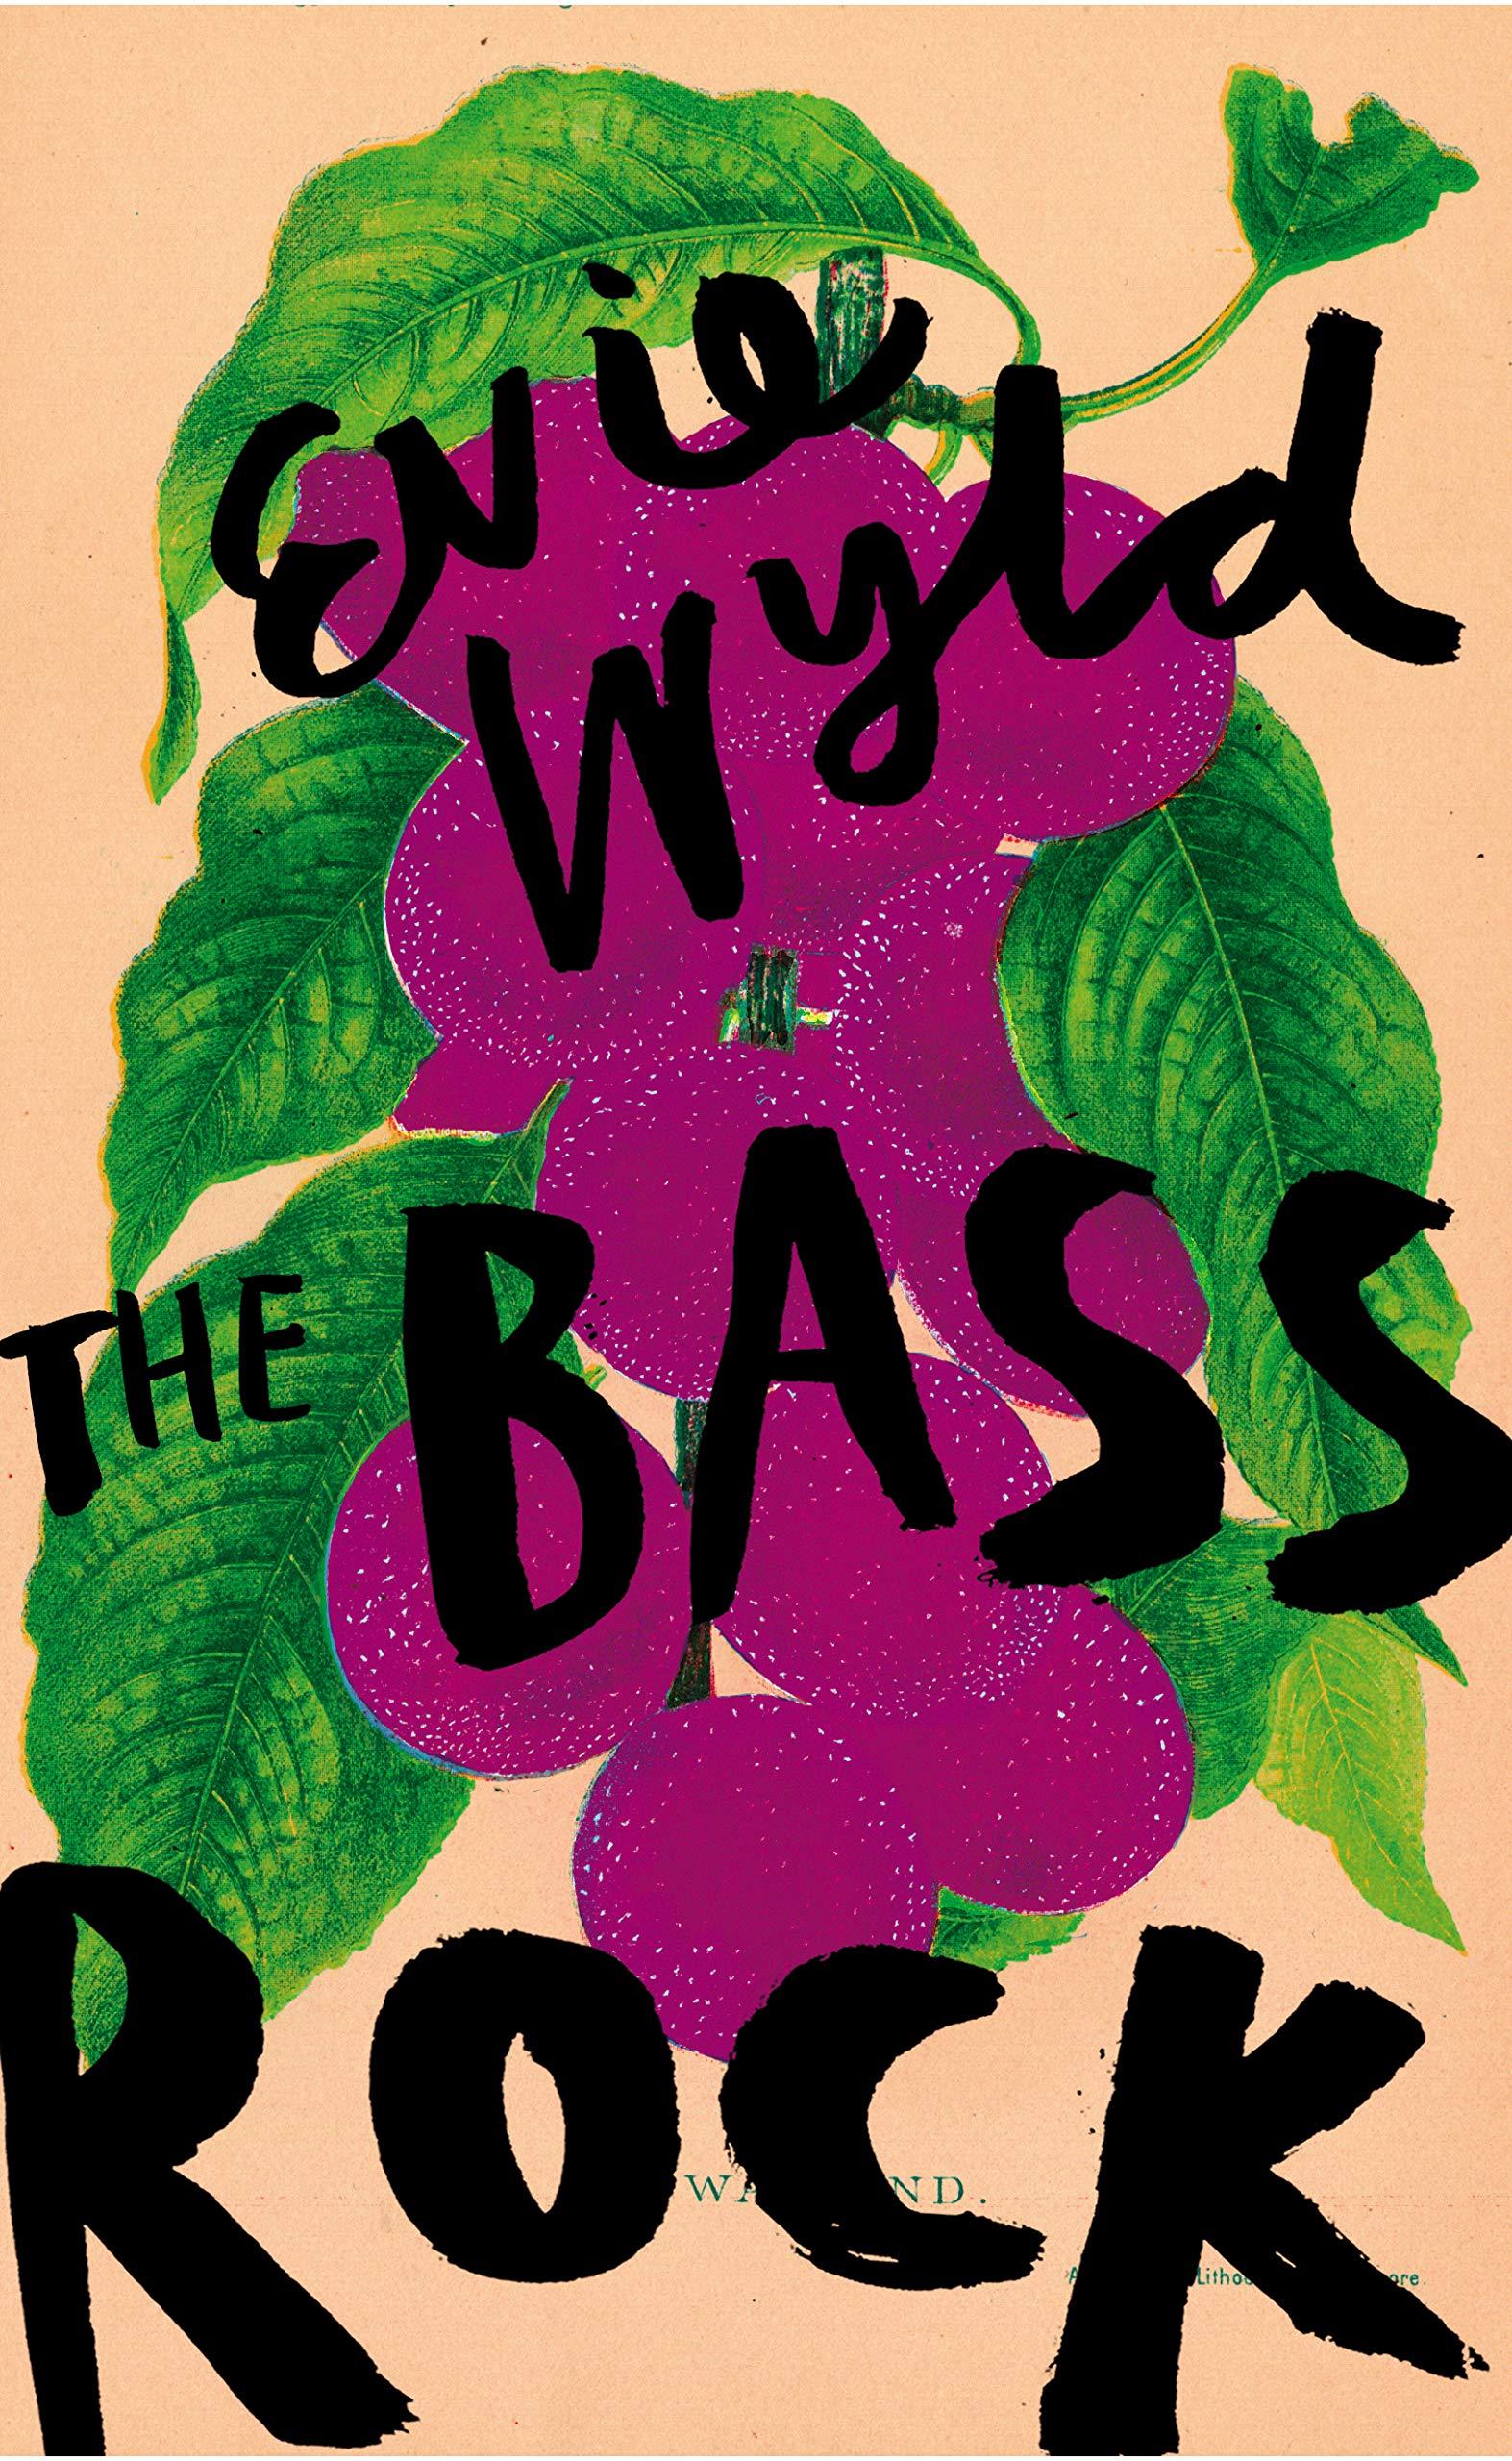 The Bass Rock: Amazon.co.uk: Wyld, Evie: 9781911214397: Books